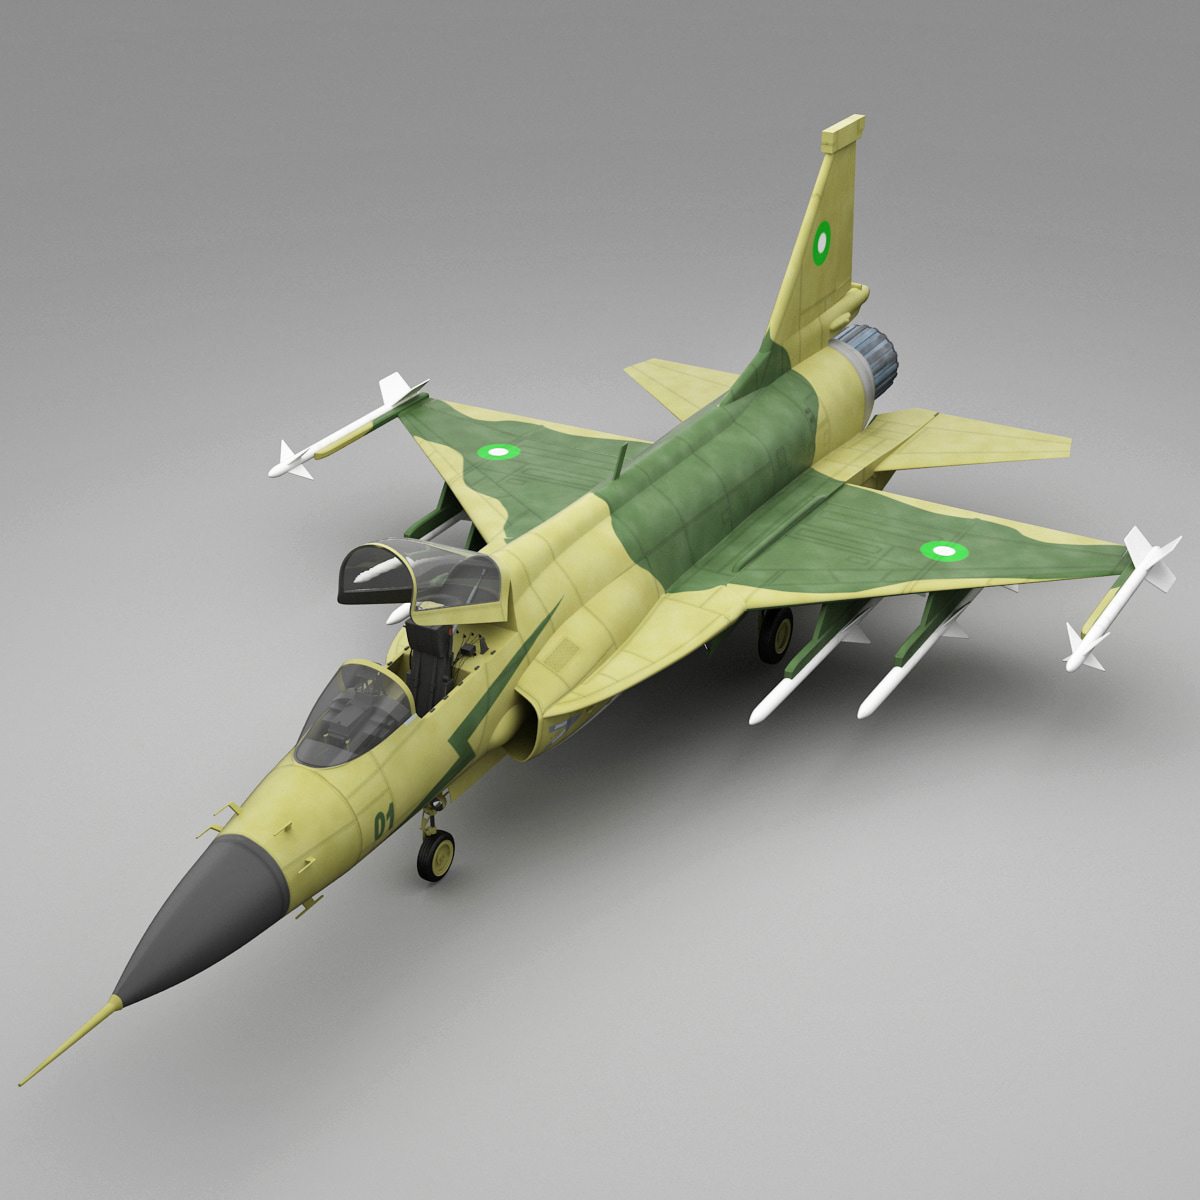 Thunder_Fighter_V2_Rigged_0001.jpg